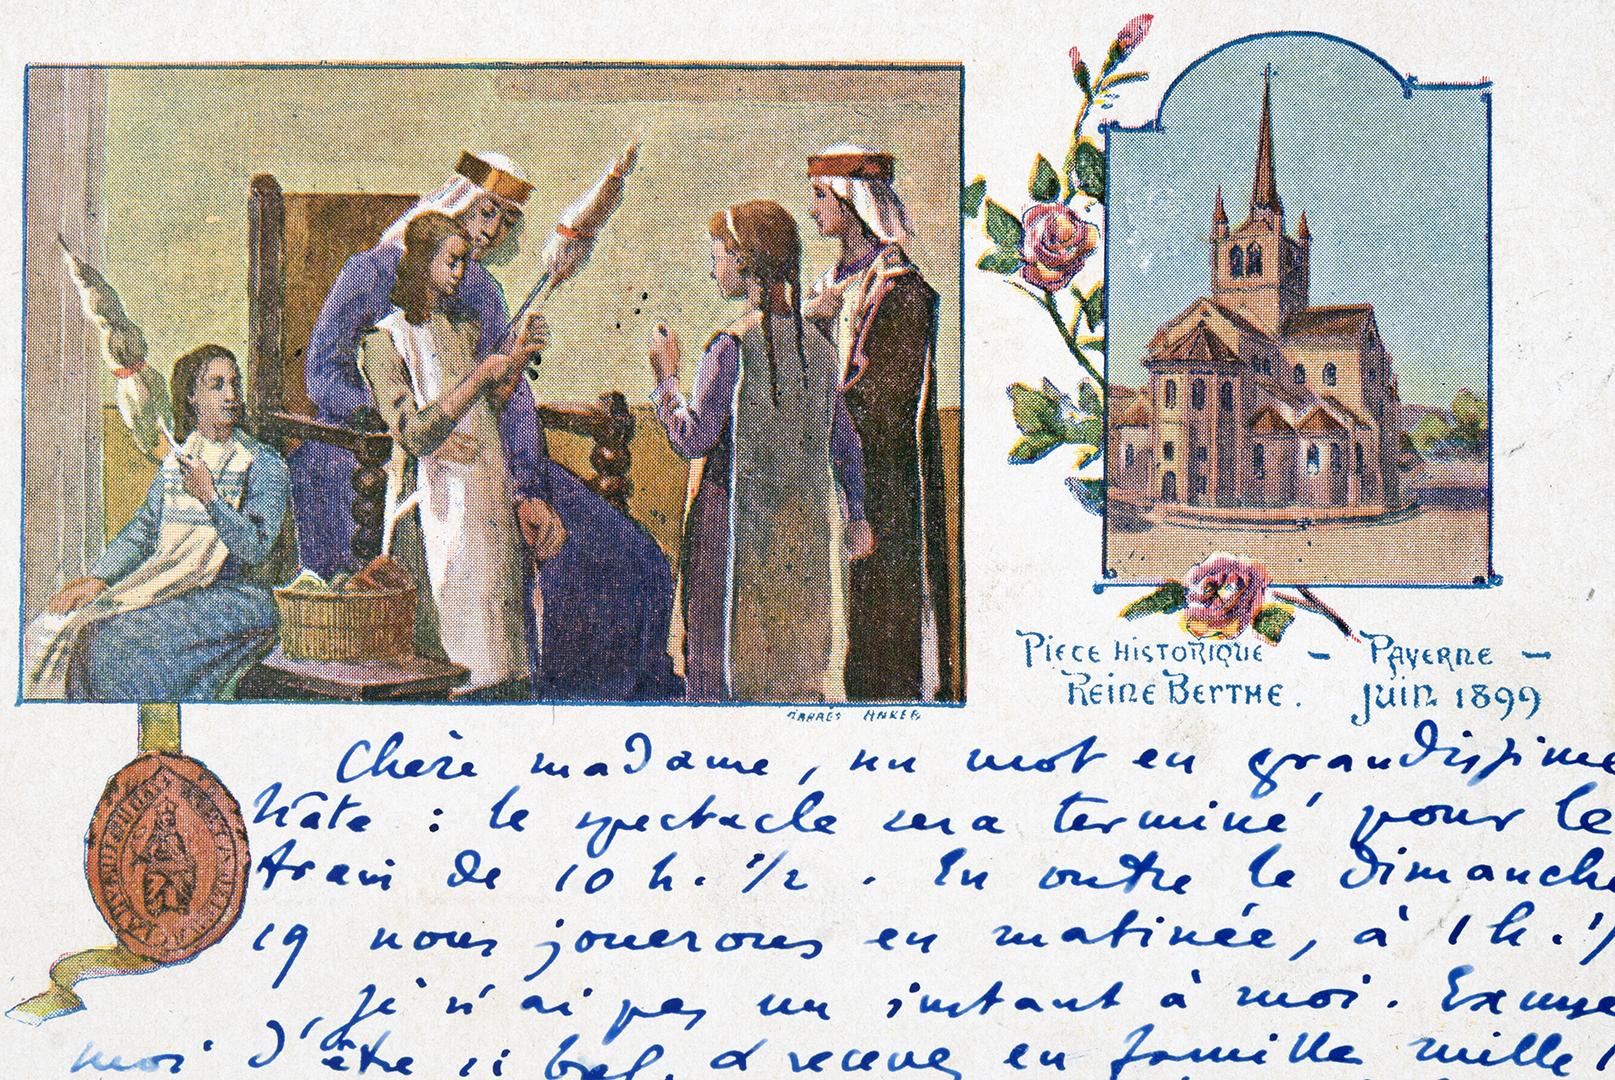 Postkarte mit Berta-Sujet von 1899.